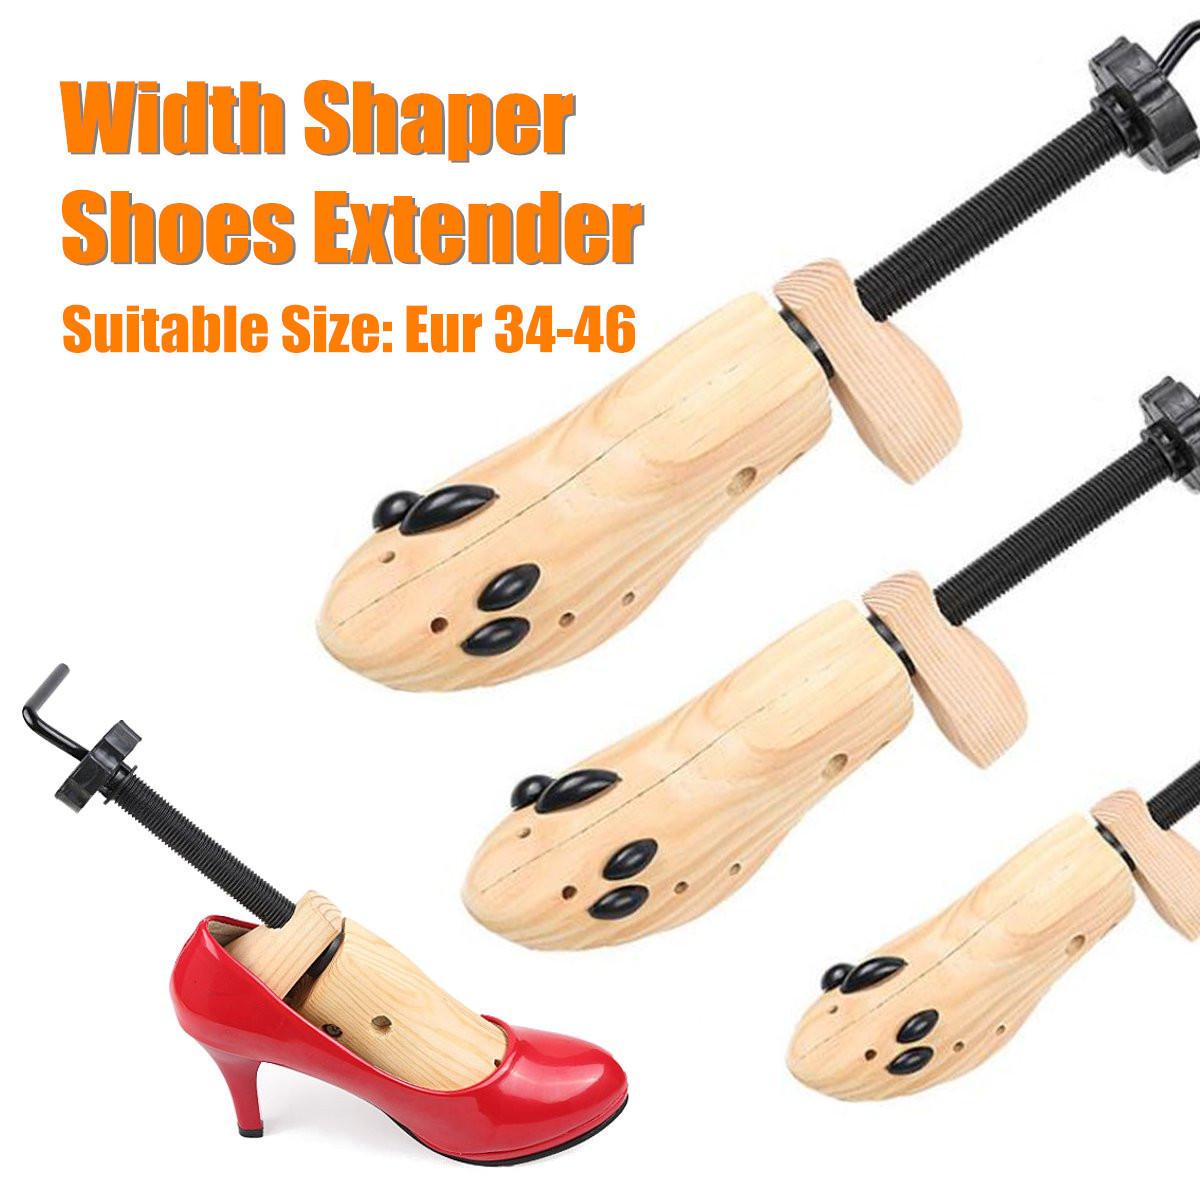 S/m/l Pu Width Extender Wood Adjustable High-heel Shoes Shaper Stretcher Tools Boots Expander Trees Rack Organizer Q190617